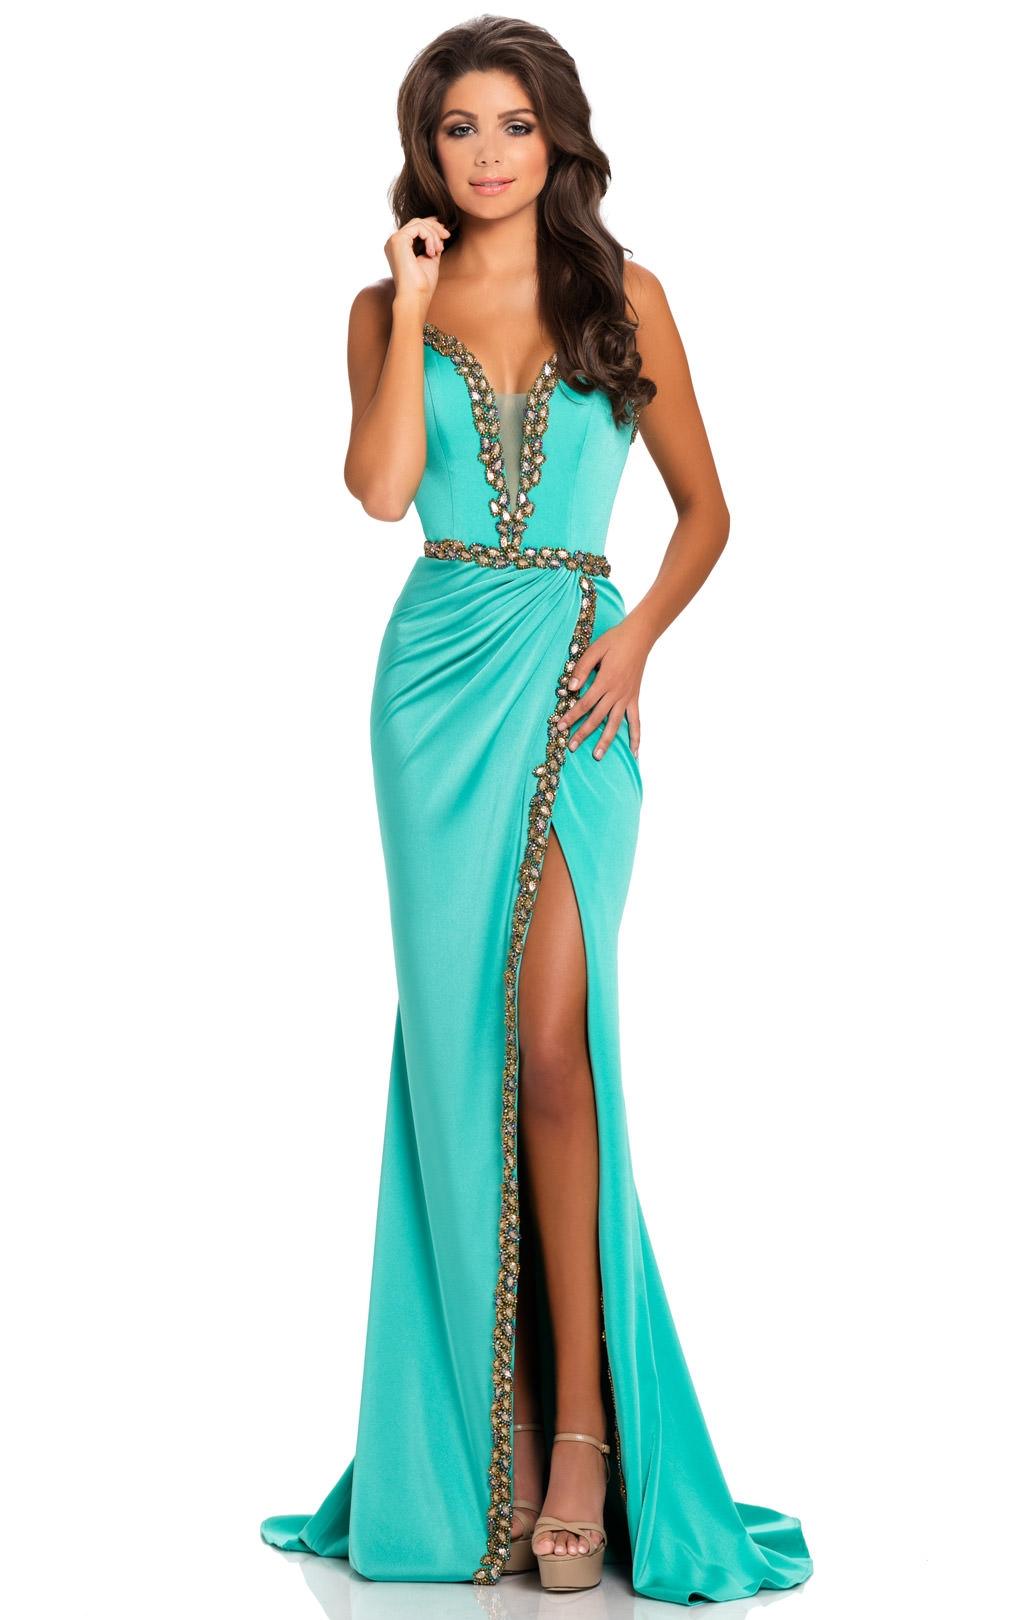 Johnathan Kayne 8076 - Strapless Stretch Crepe Slit Prom Dress